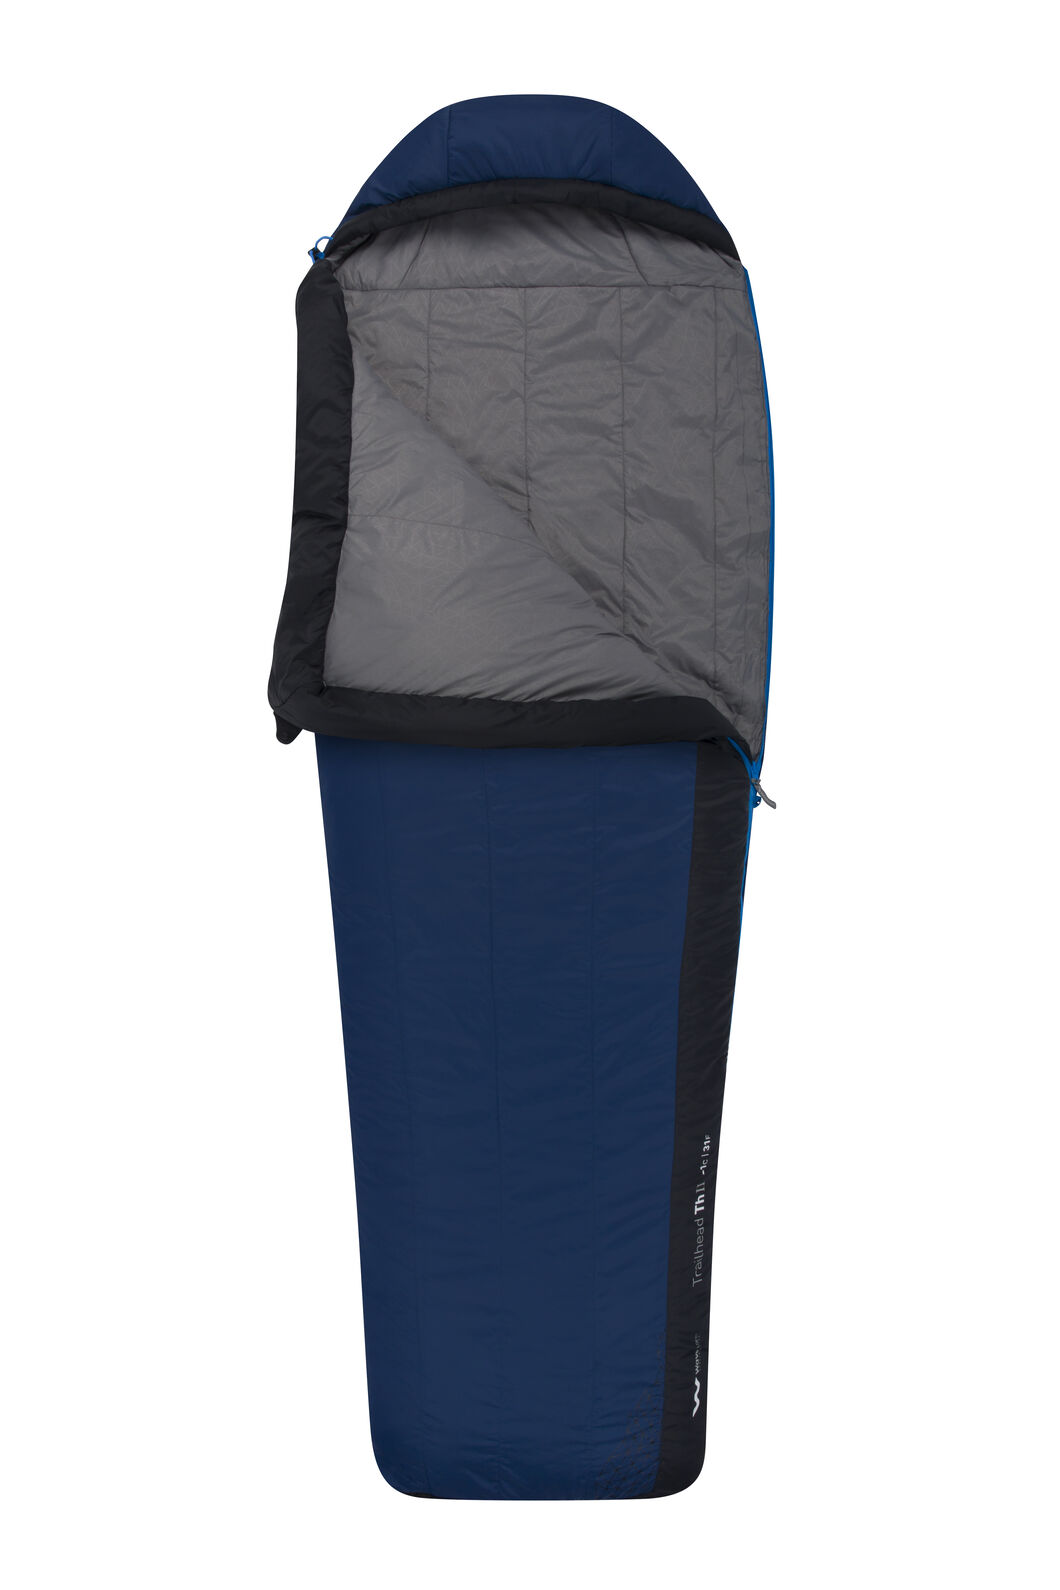 Sea to Summit Trailhead II Sleeping Bag - Long, Dark Blue, hi-res